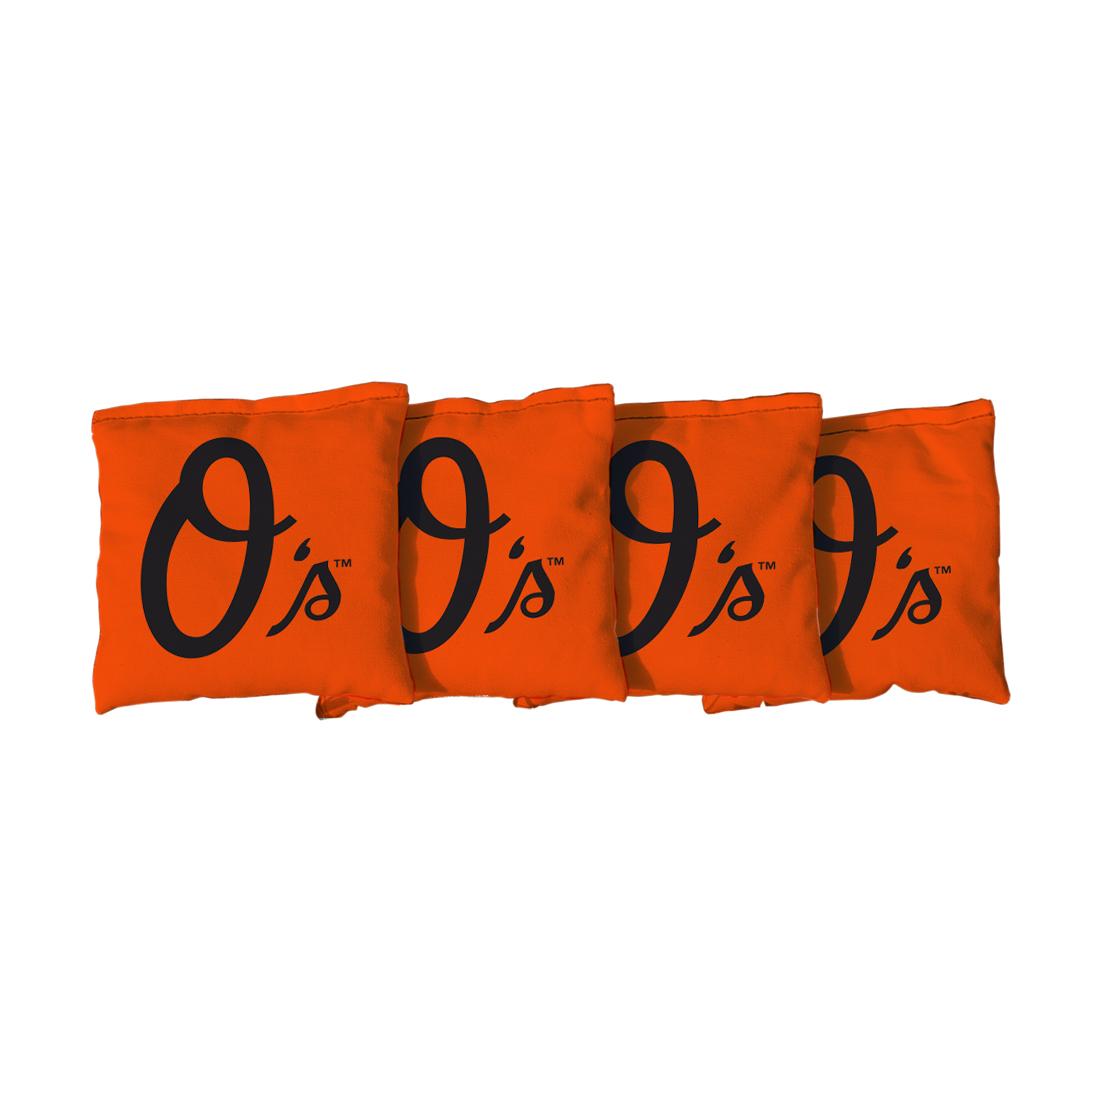 4 Baltimore Orioles Orange Cornhole Bags